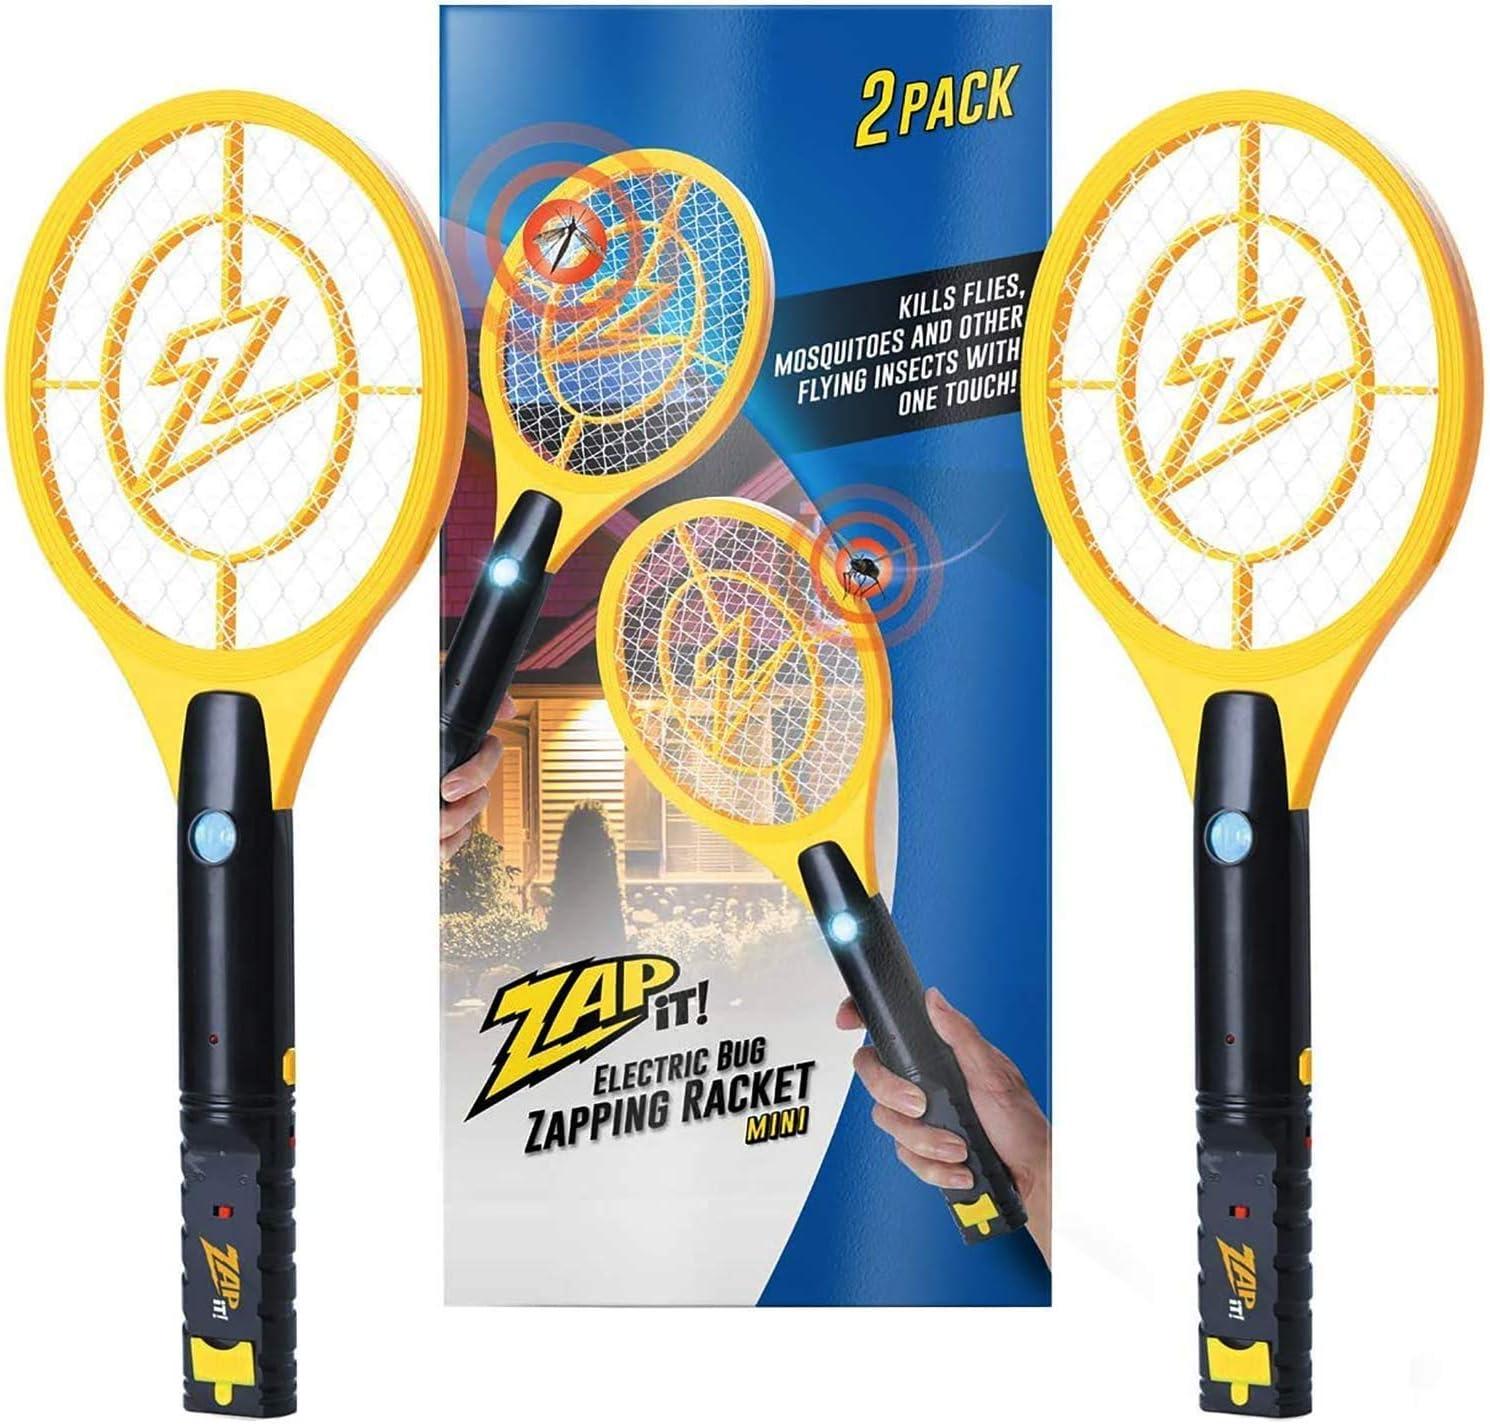 Zap It Bug Zapper Rechargeable Bug Zapper Racket, 4, 000 Volt, USB Charging Cable, 2 Pack : Garden & Outdoor